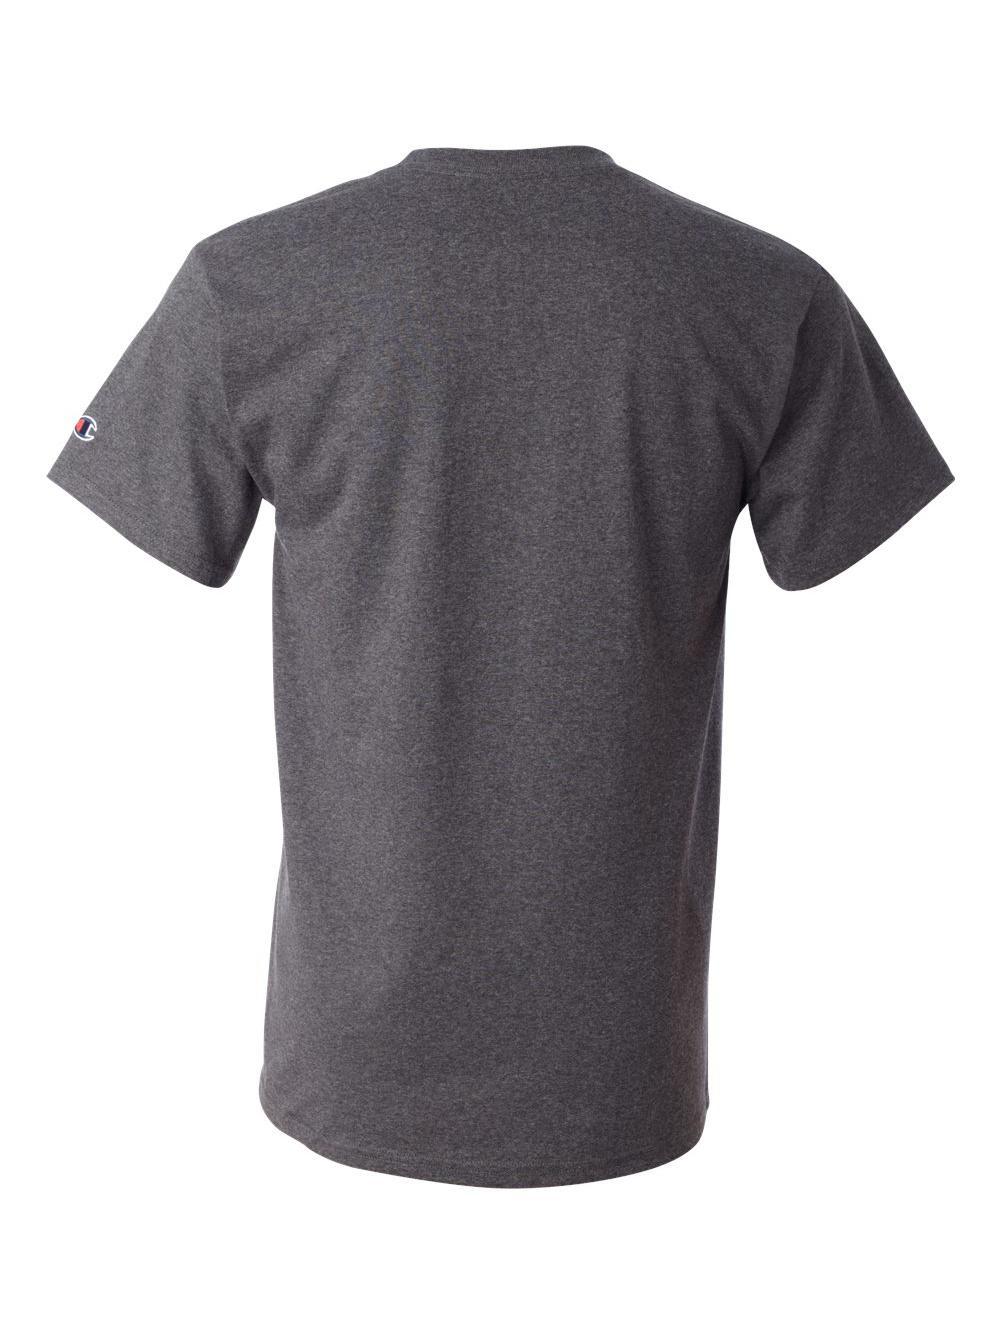 Champion-Short-Sleeve-T-Shirt-T425 thumbnail 10